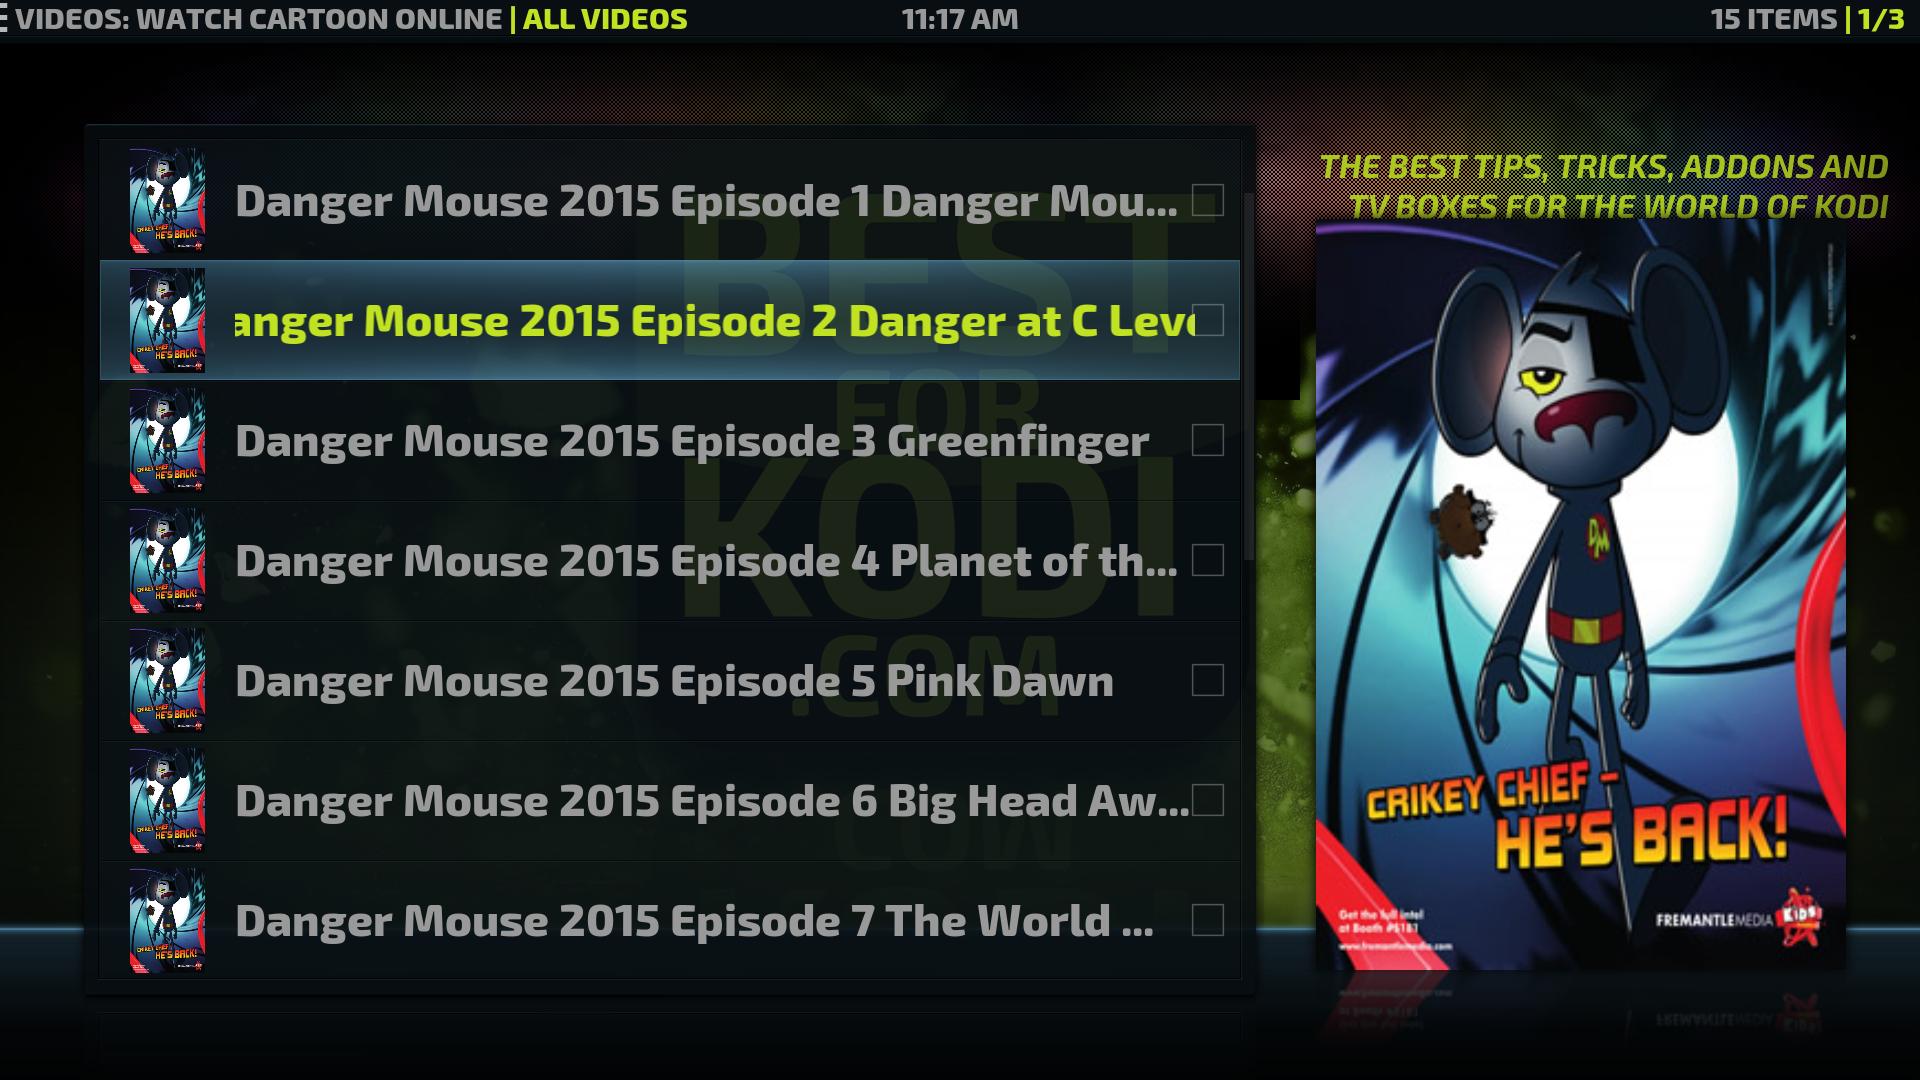 Screenshot 2015-11-17 11.17.01